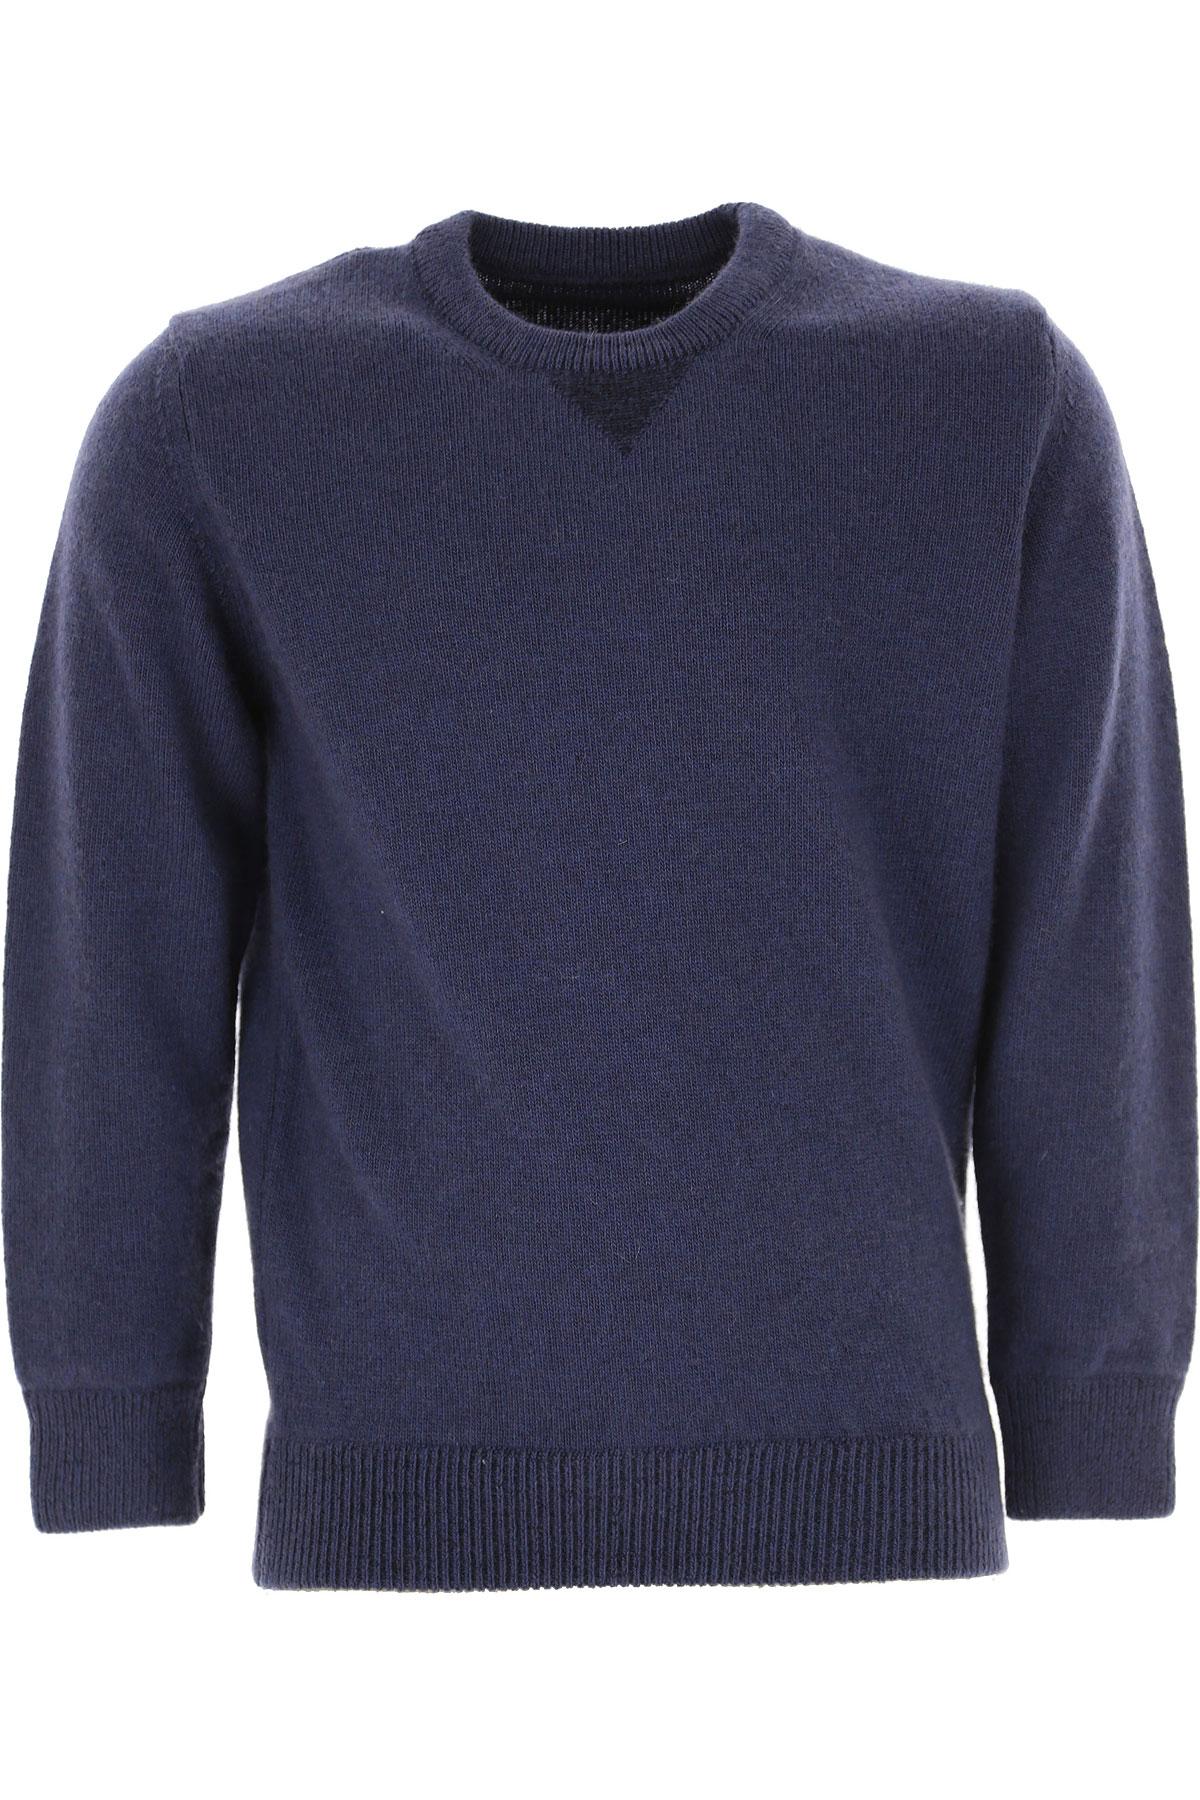 Jurta Kids Sweaters for Boys On Sale, Blue Navy, Cashemere, 2019, 6Y 8Y